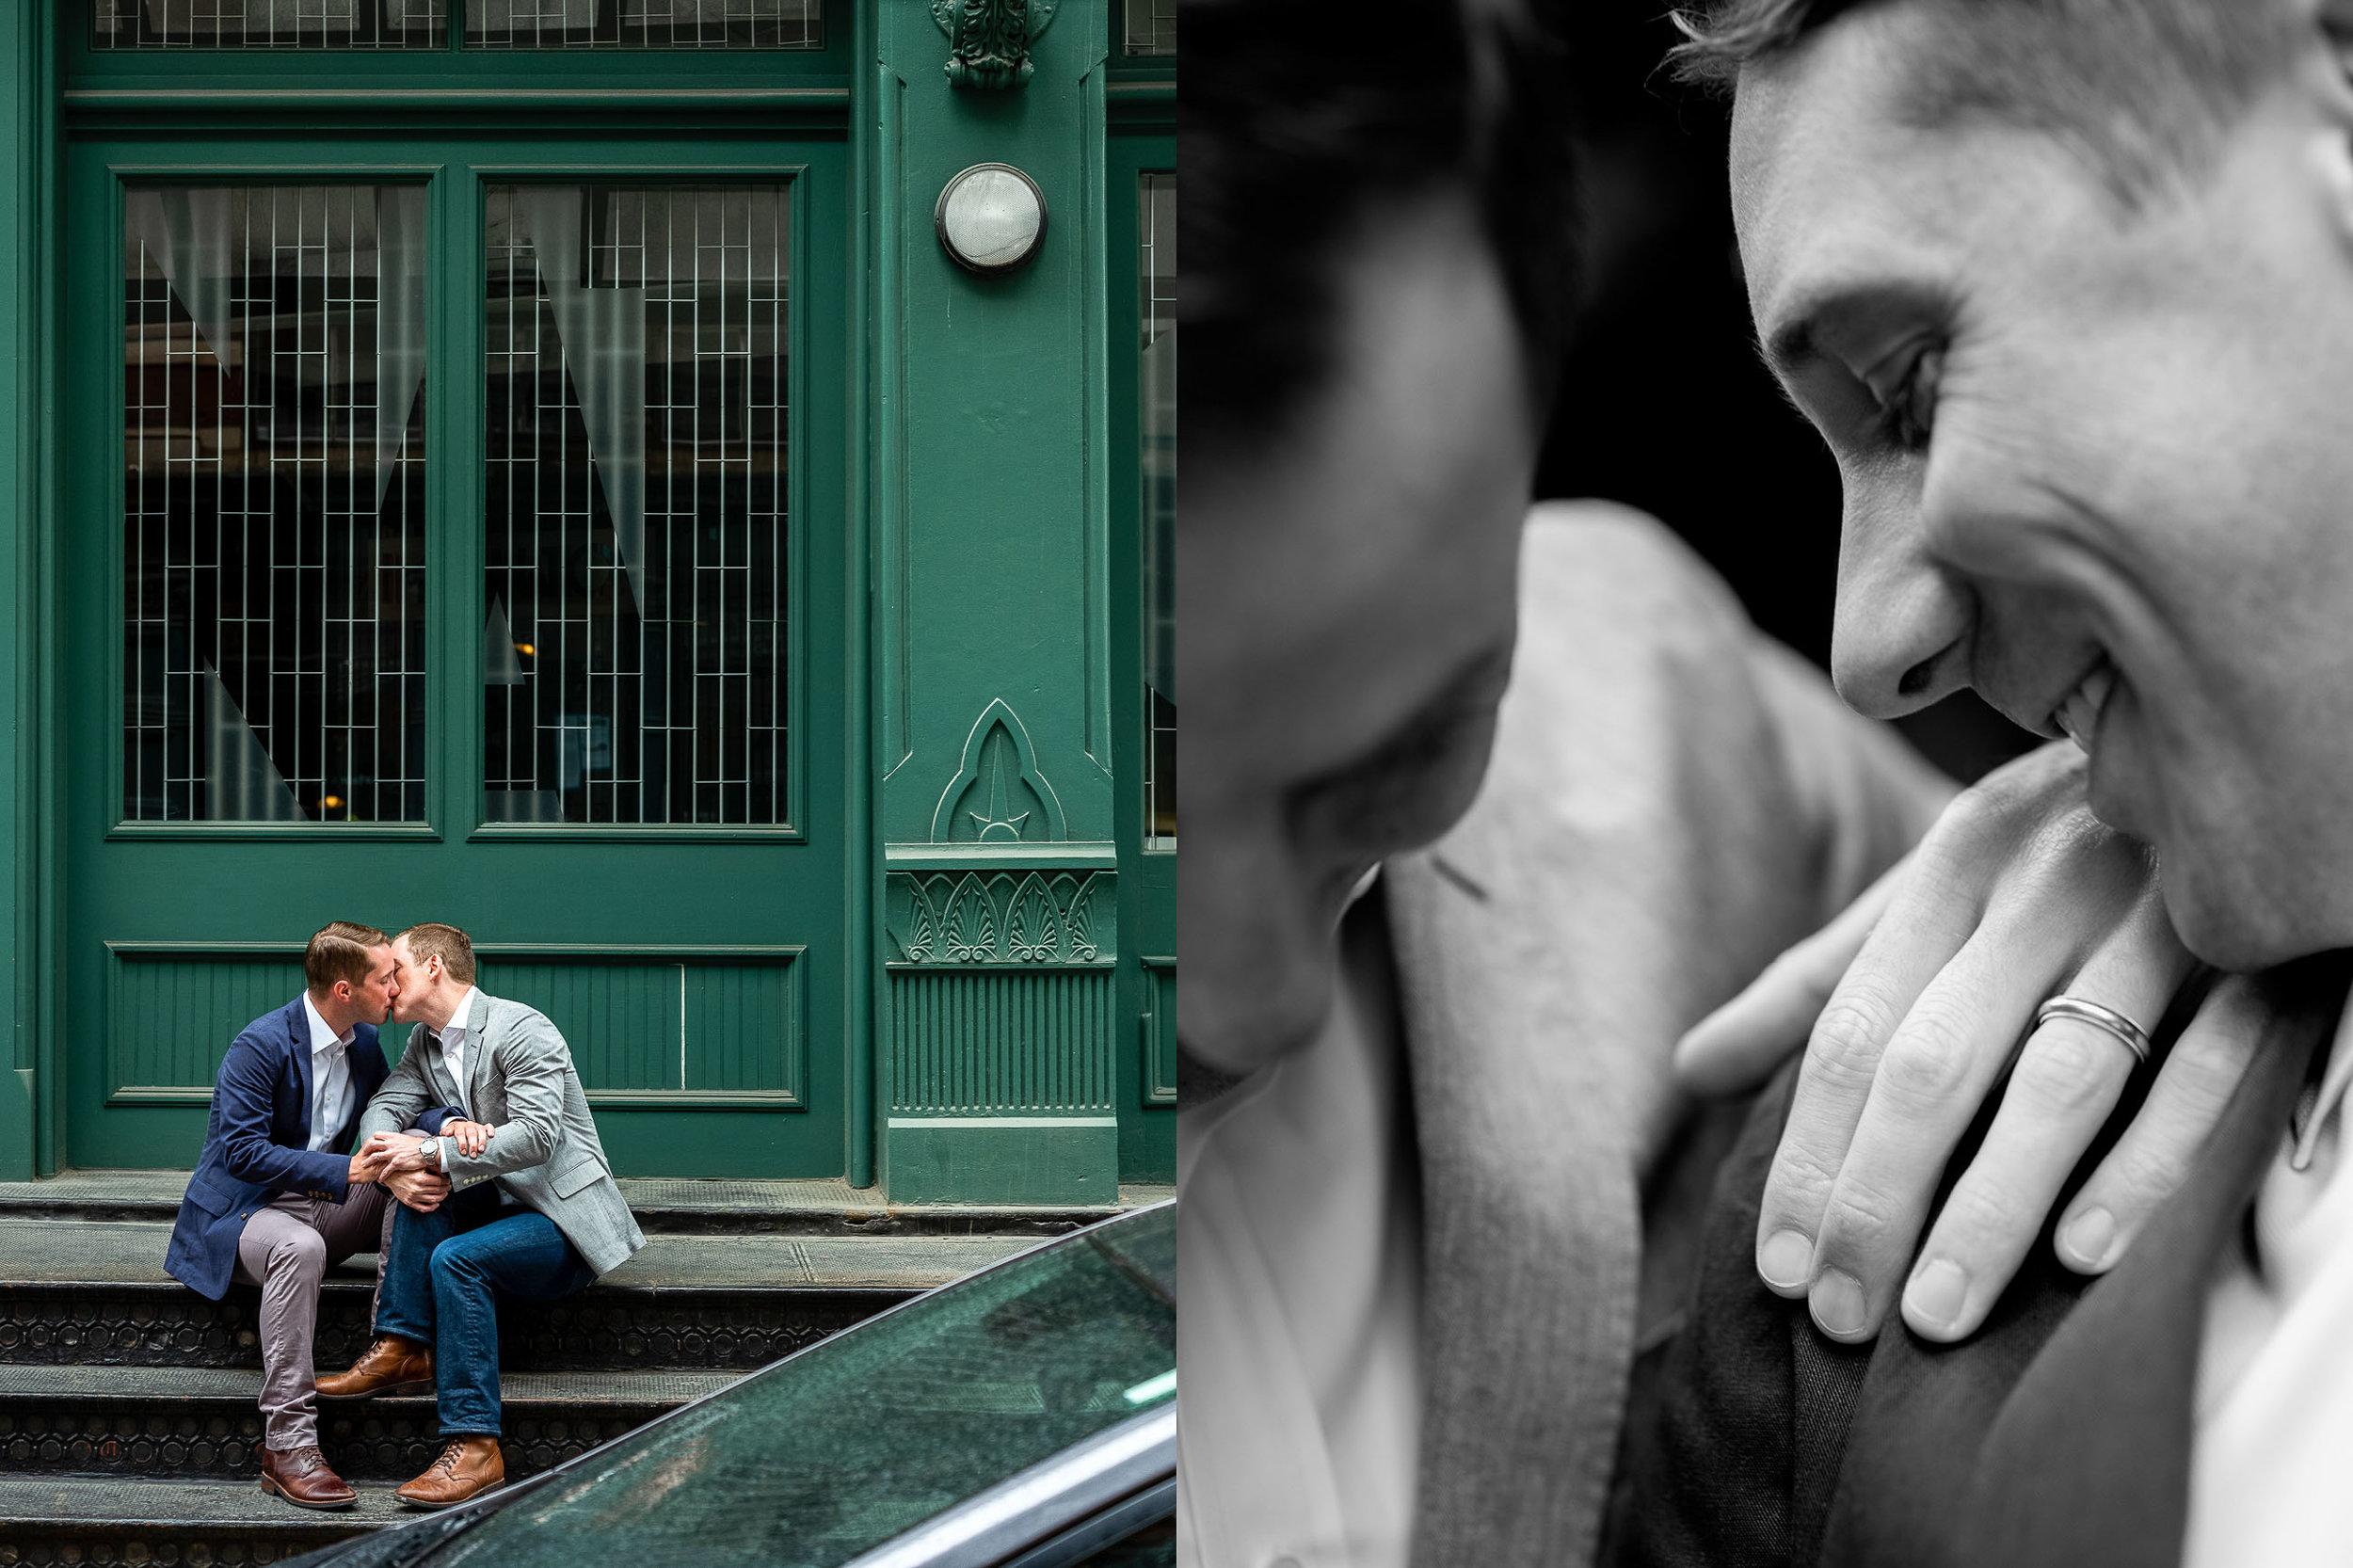 nonesuchnyc_wedding_photographers_the_loeb_boathouse_nyc_0113.JPG